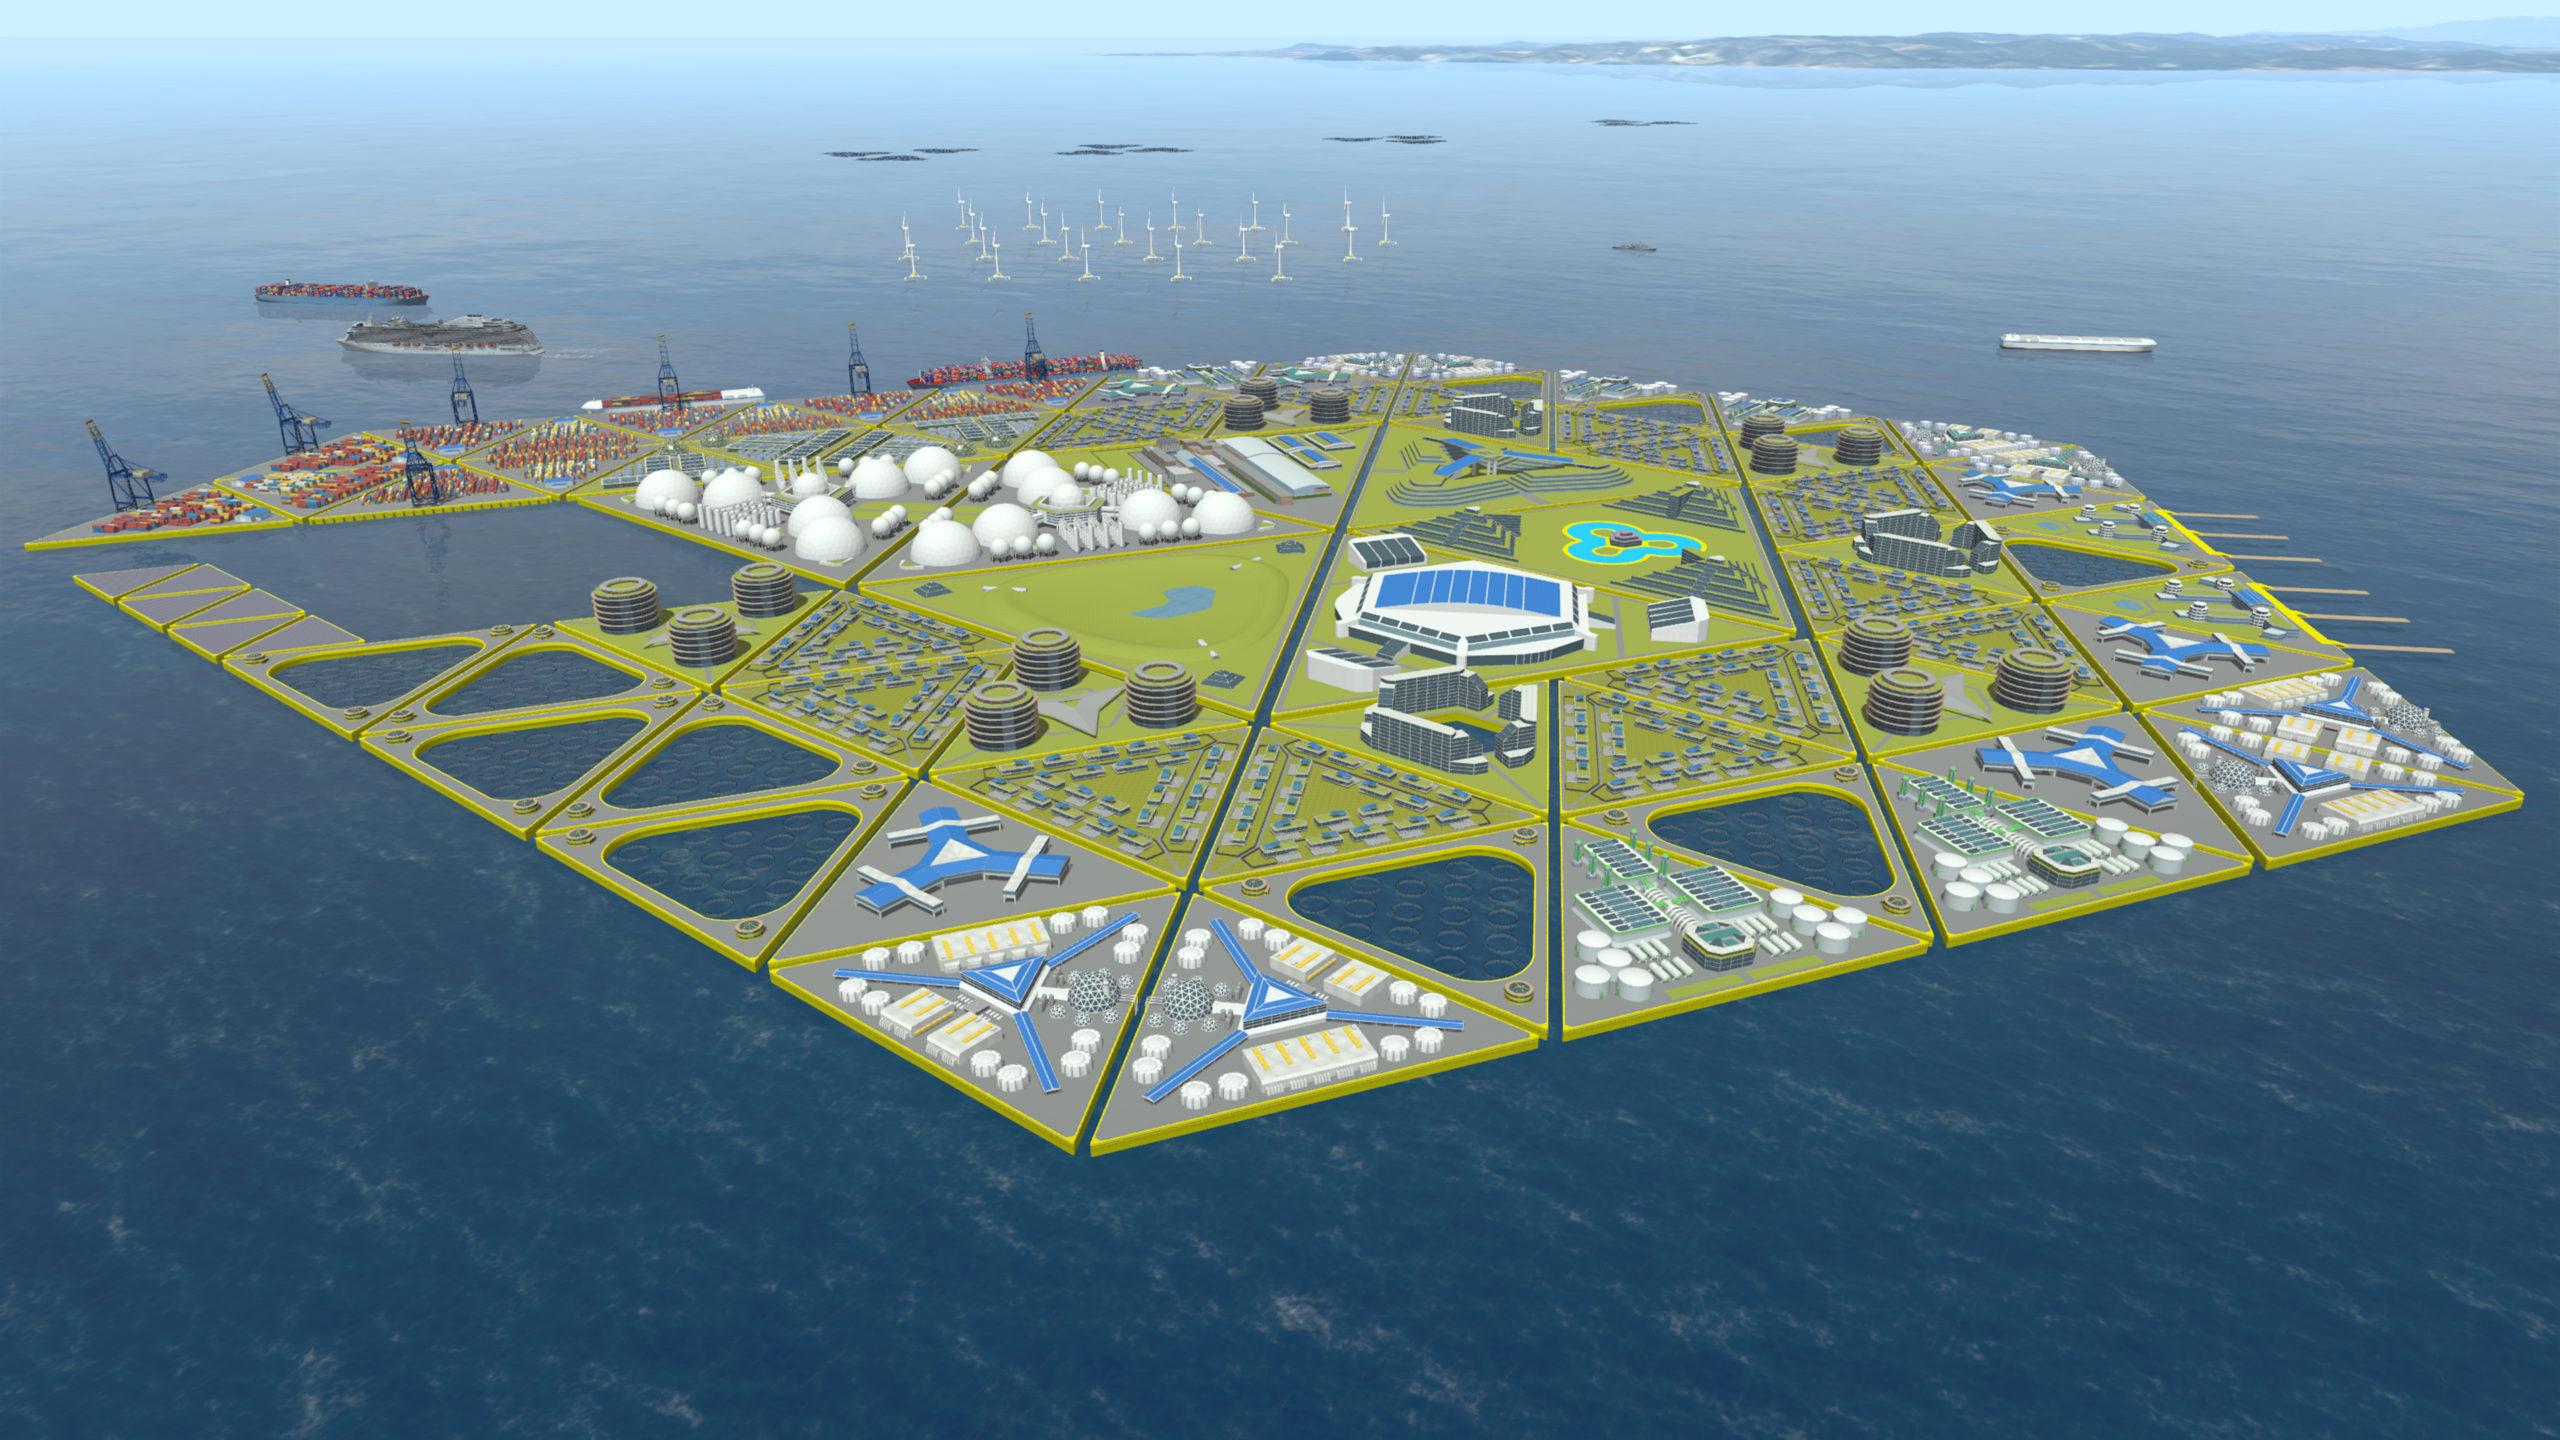 Eiland flexible port